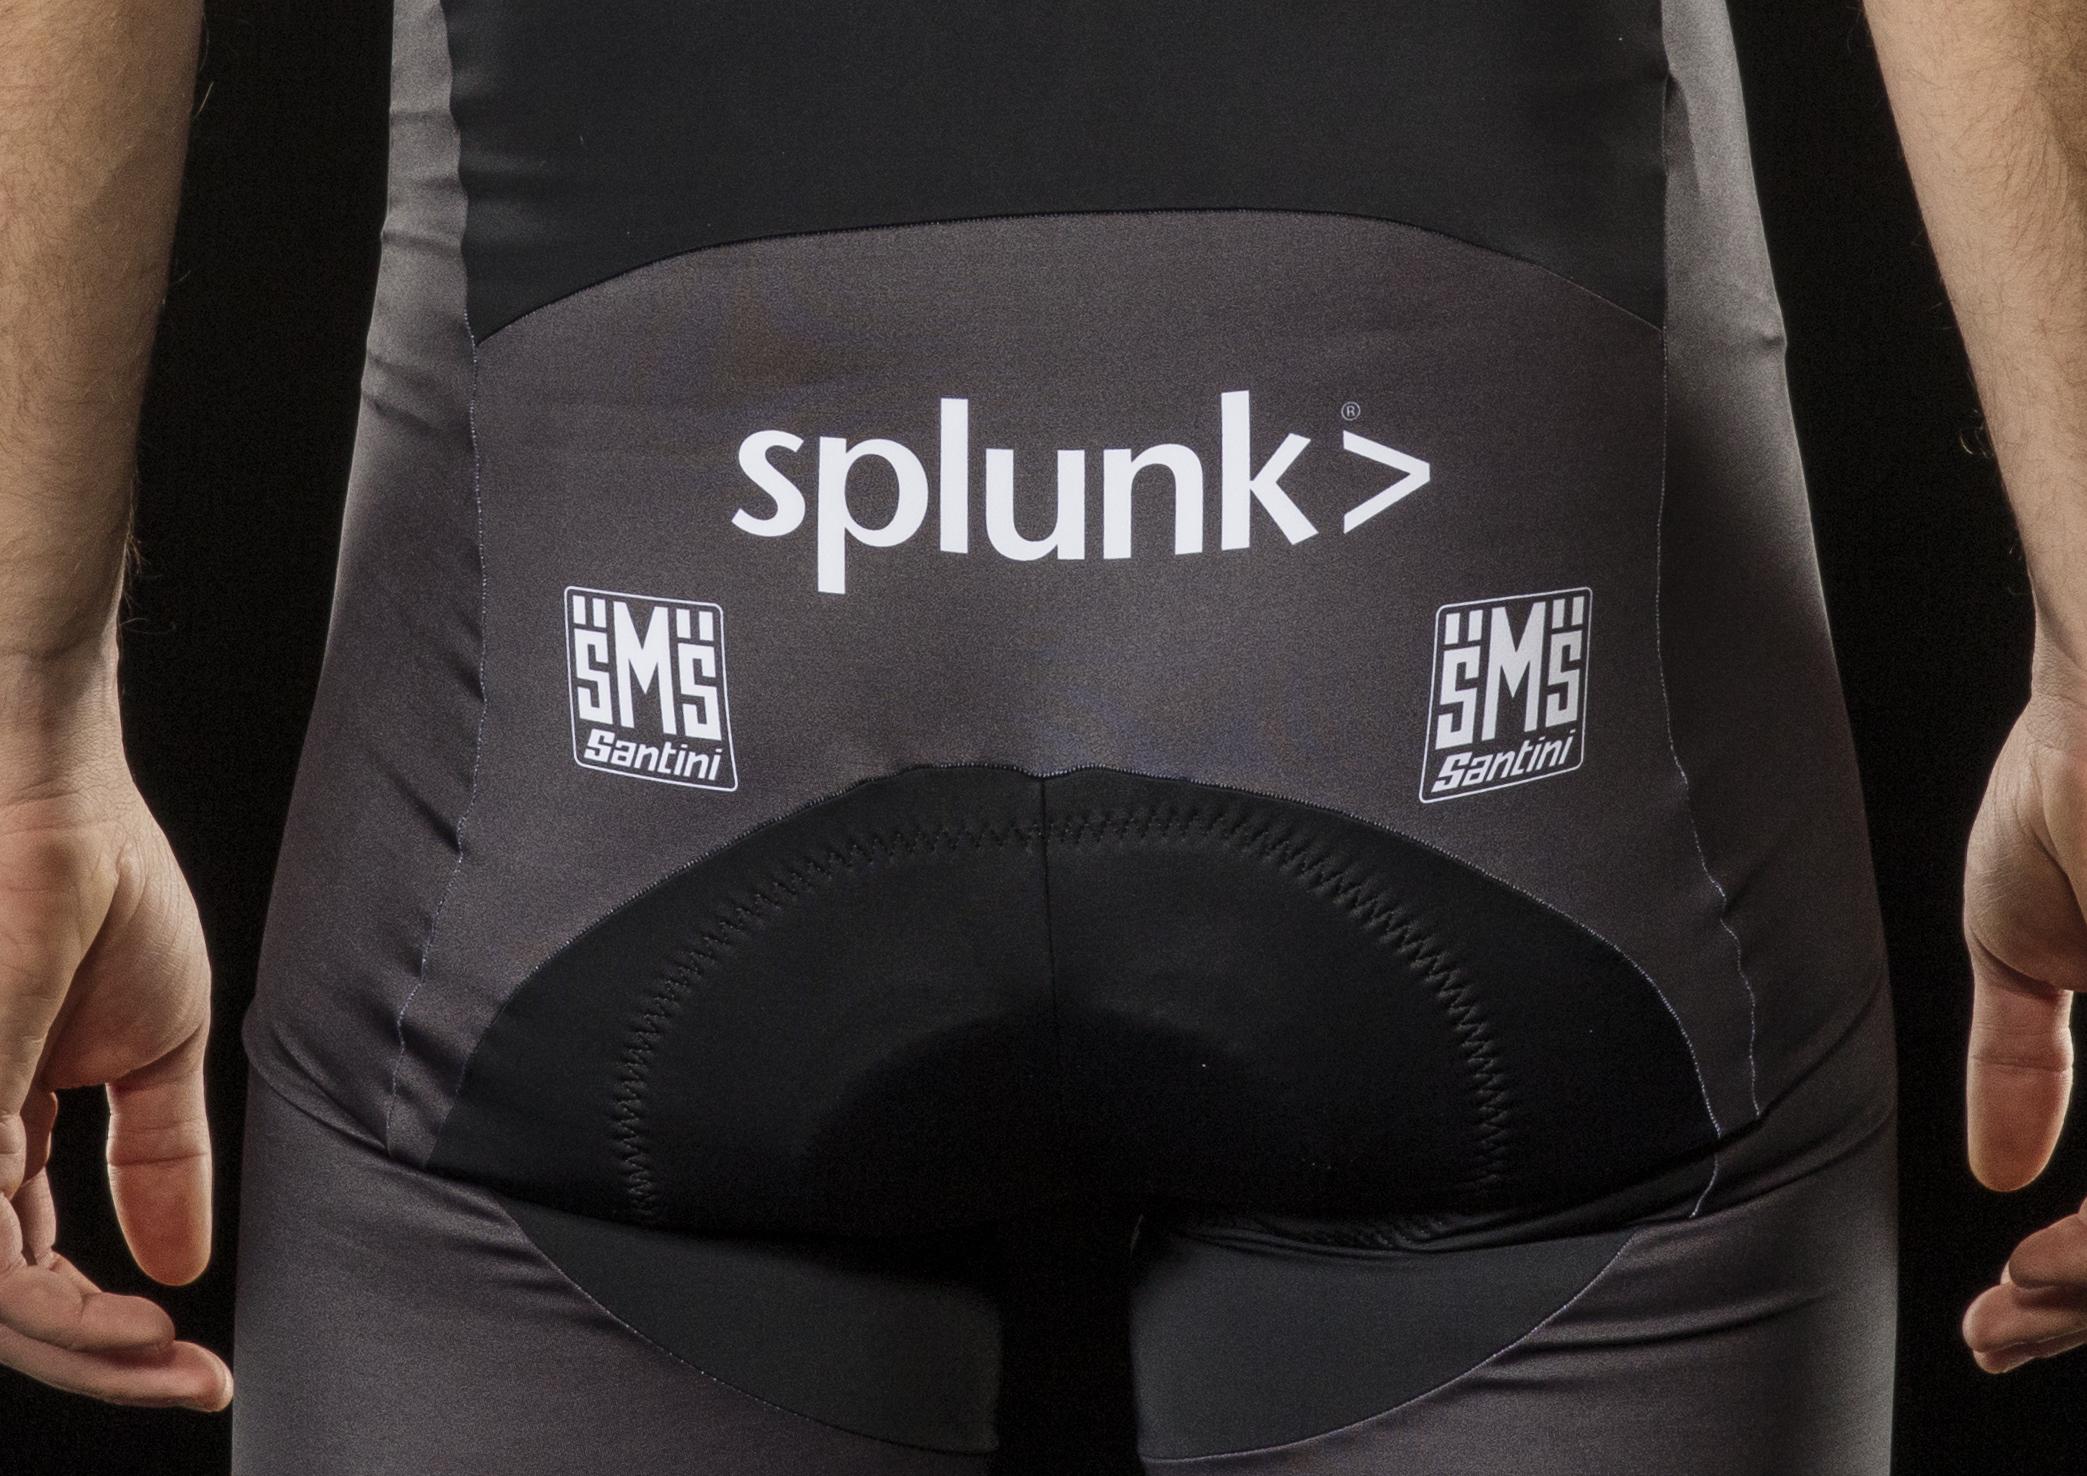 Trek-Segafredo partners with Splunk | Trek Race Shop